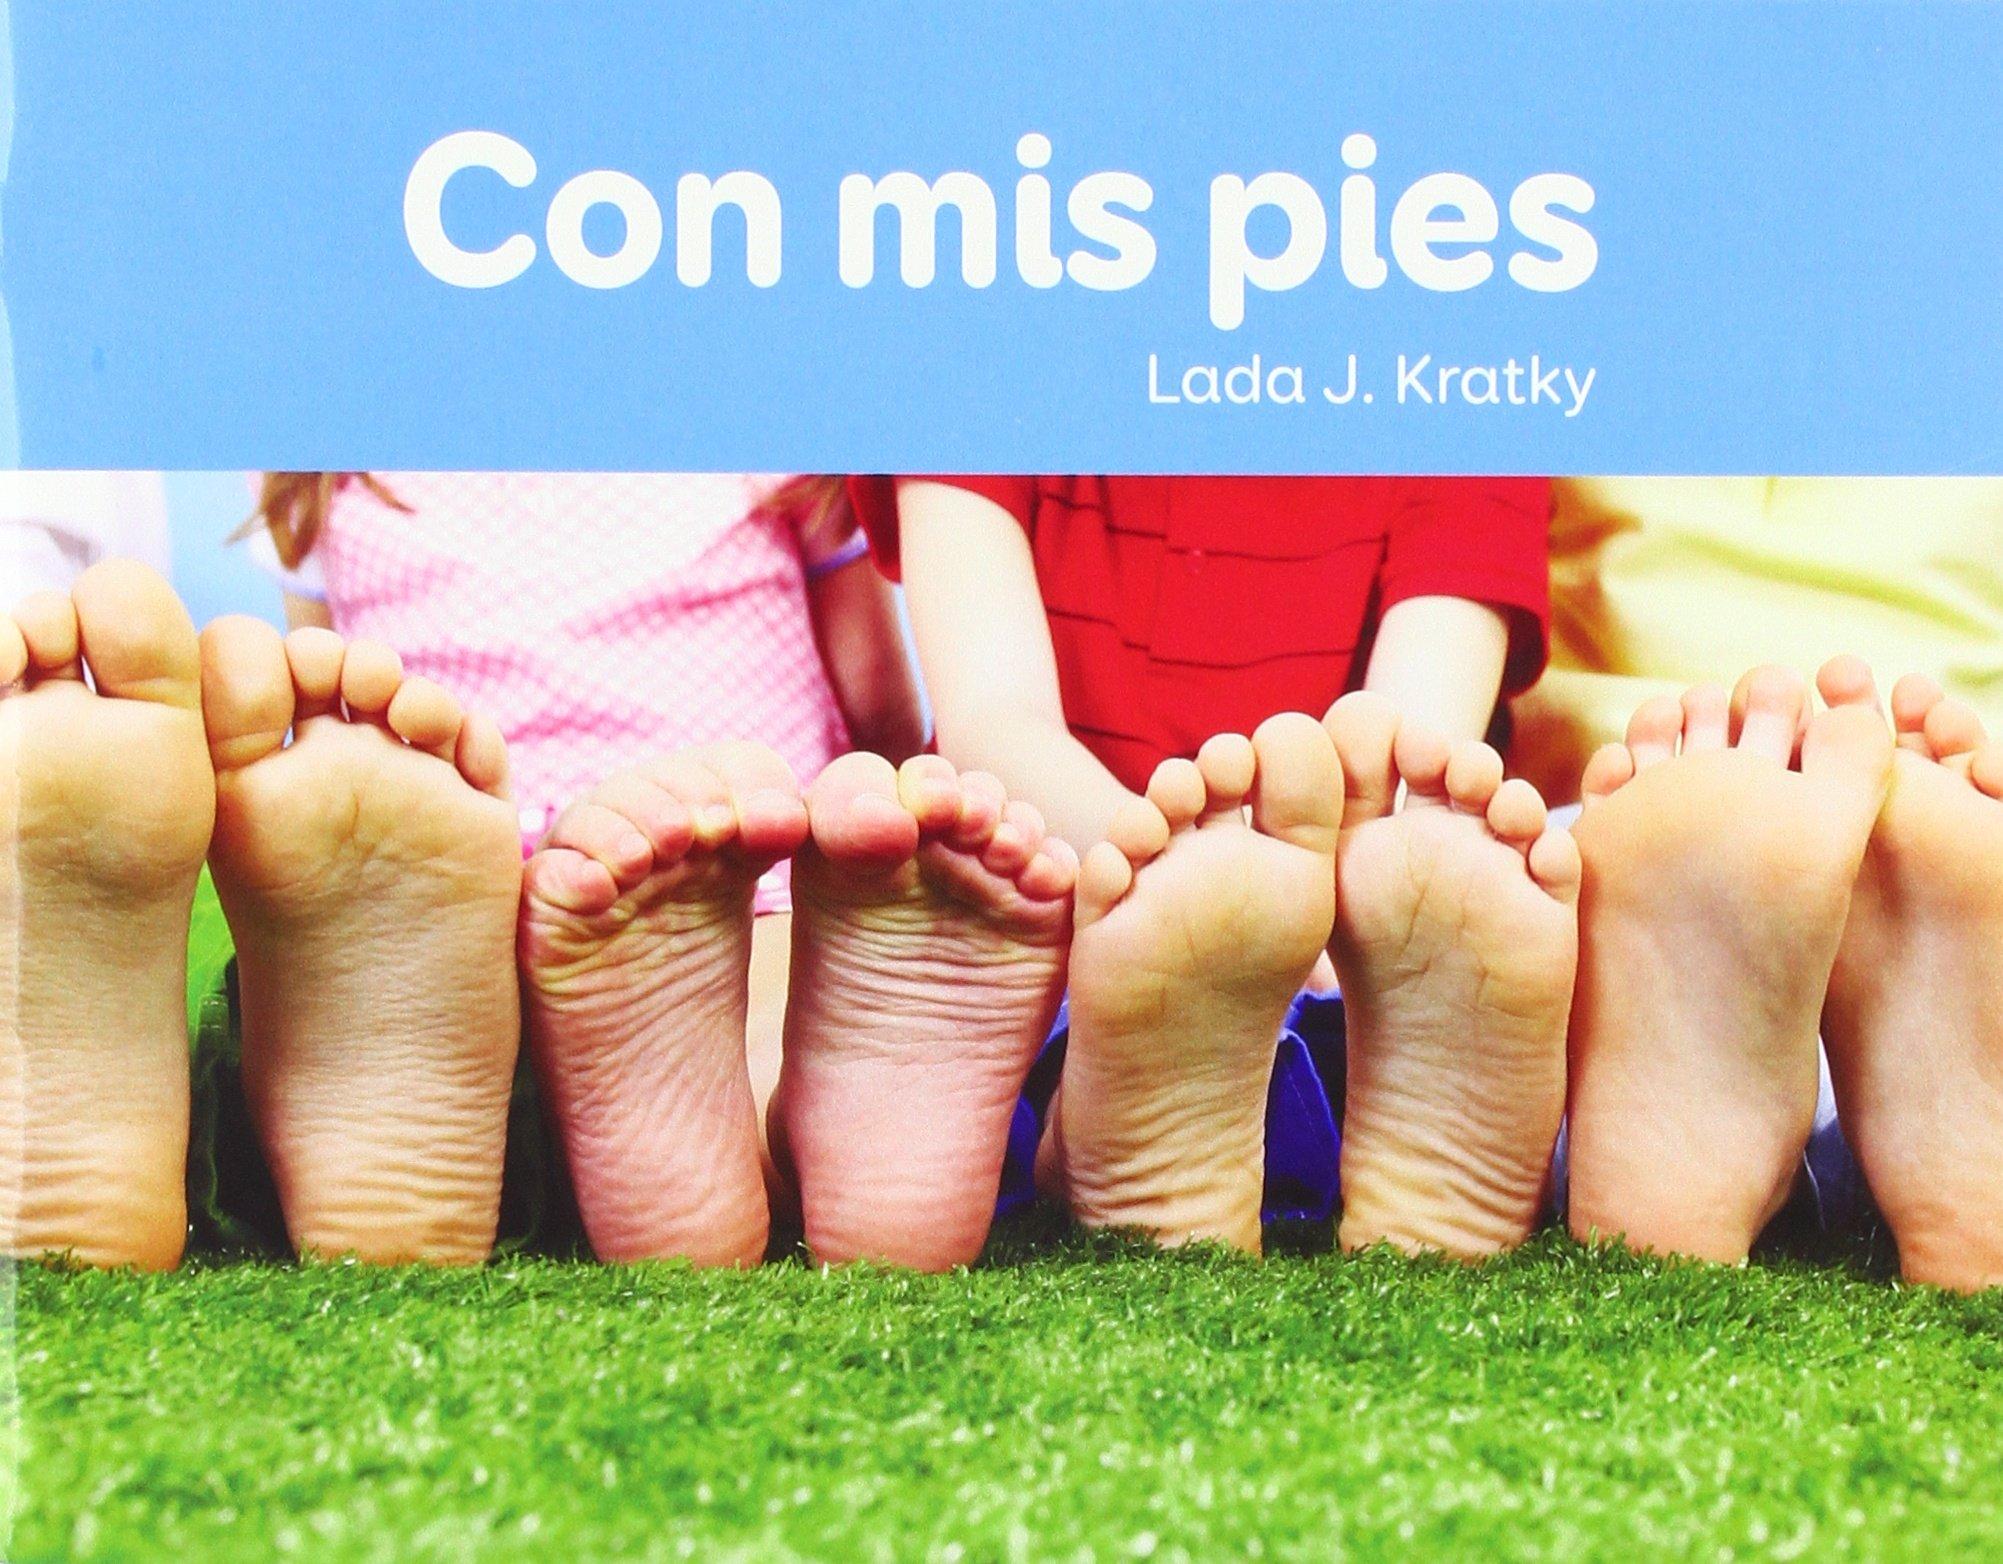 Con mis Pies (Facil de Leer / Easy to Read) (Spanish Edition) (Spanish) Paperback – June 1, 2018